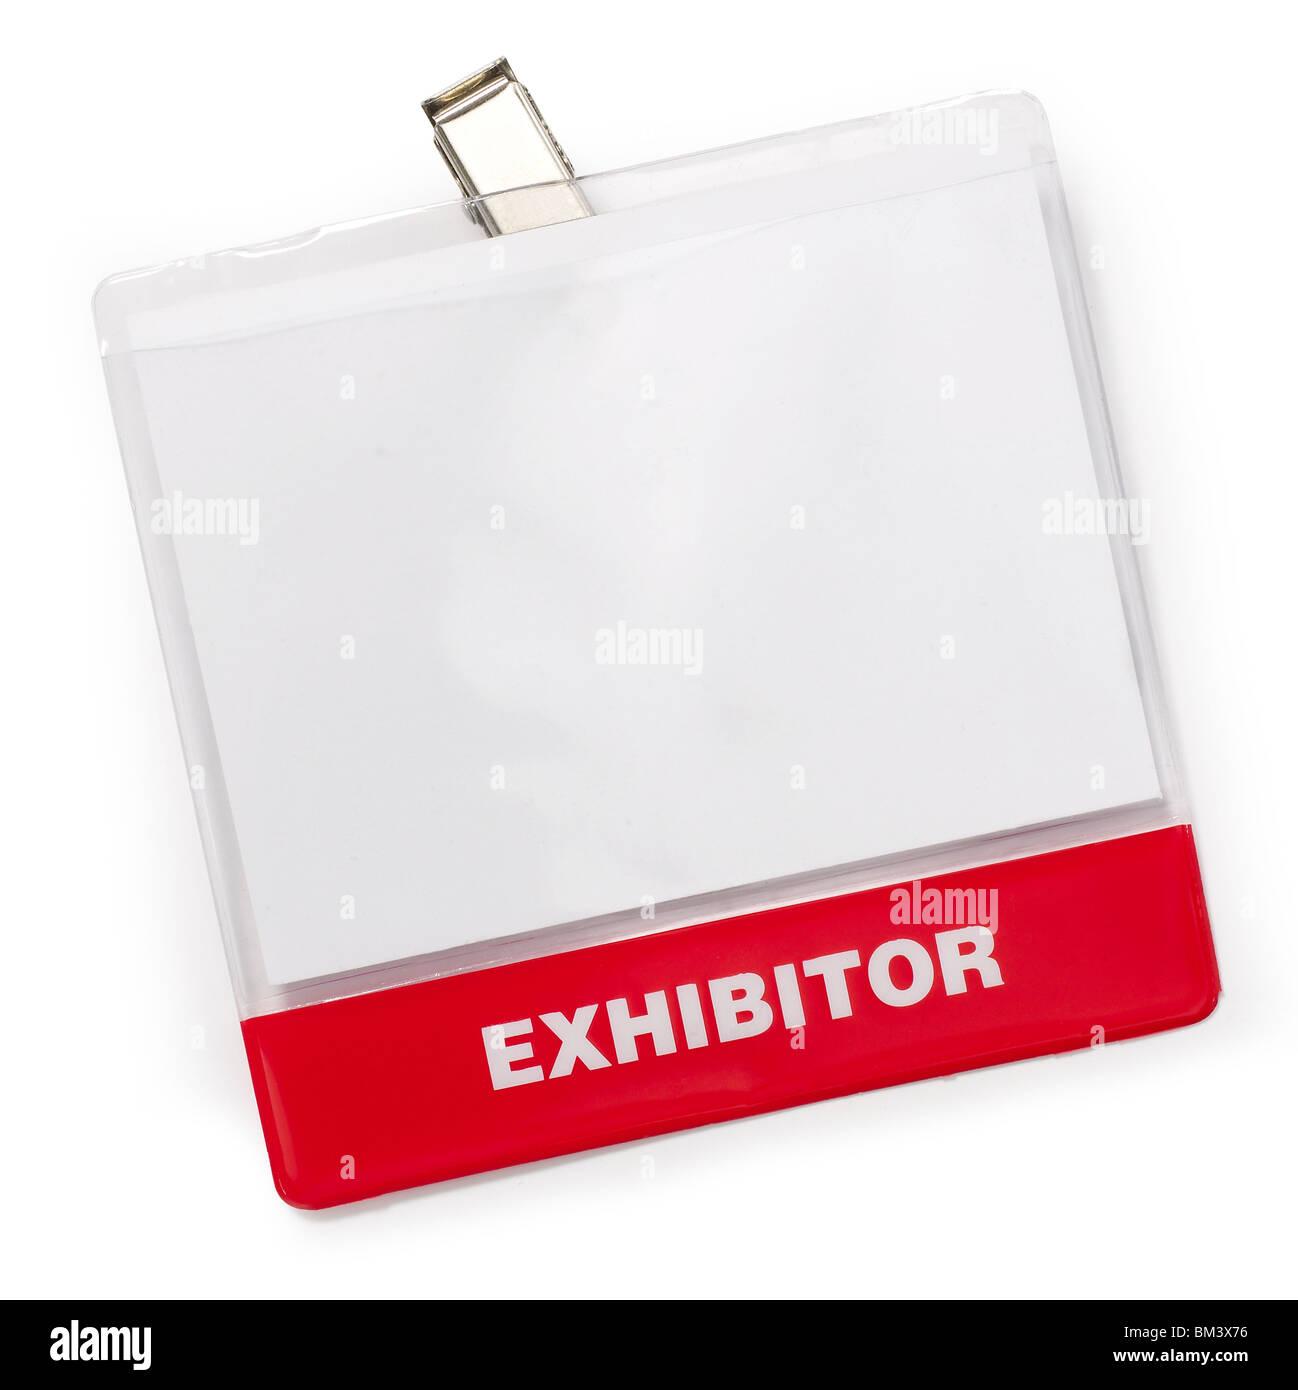 Exhibitor name badge - Stock Image